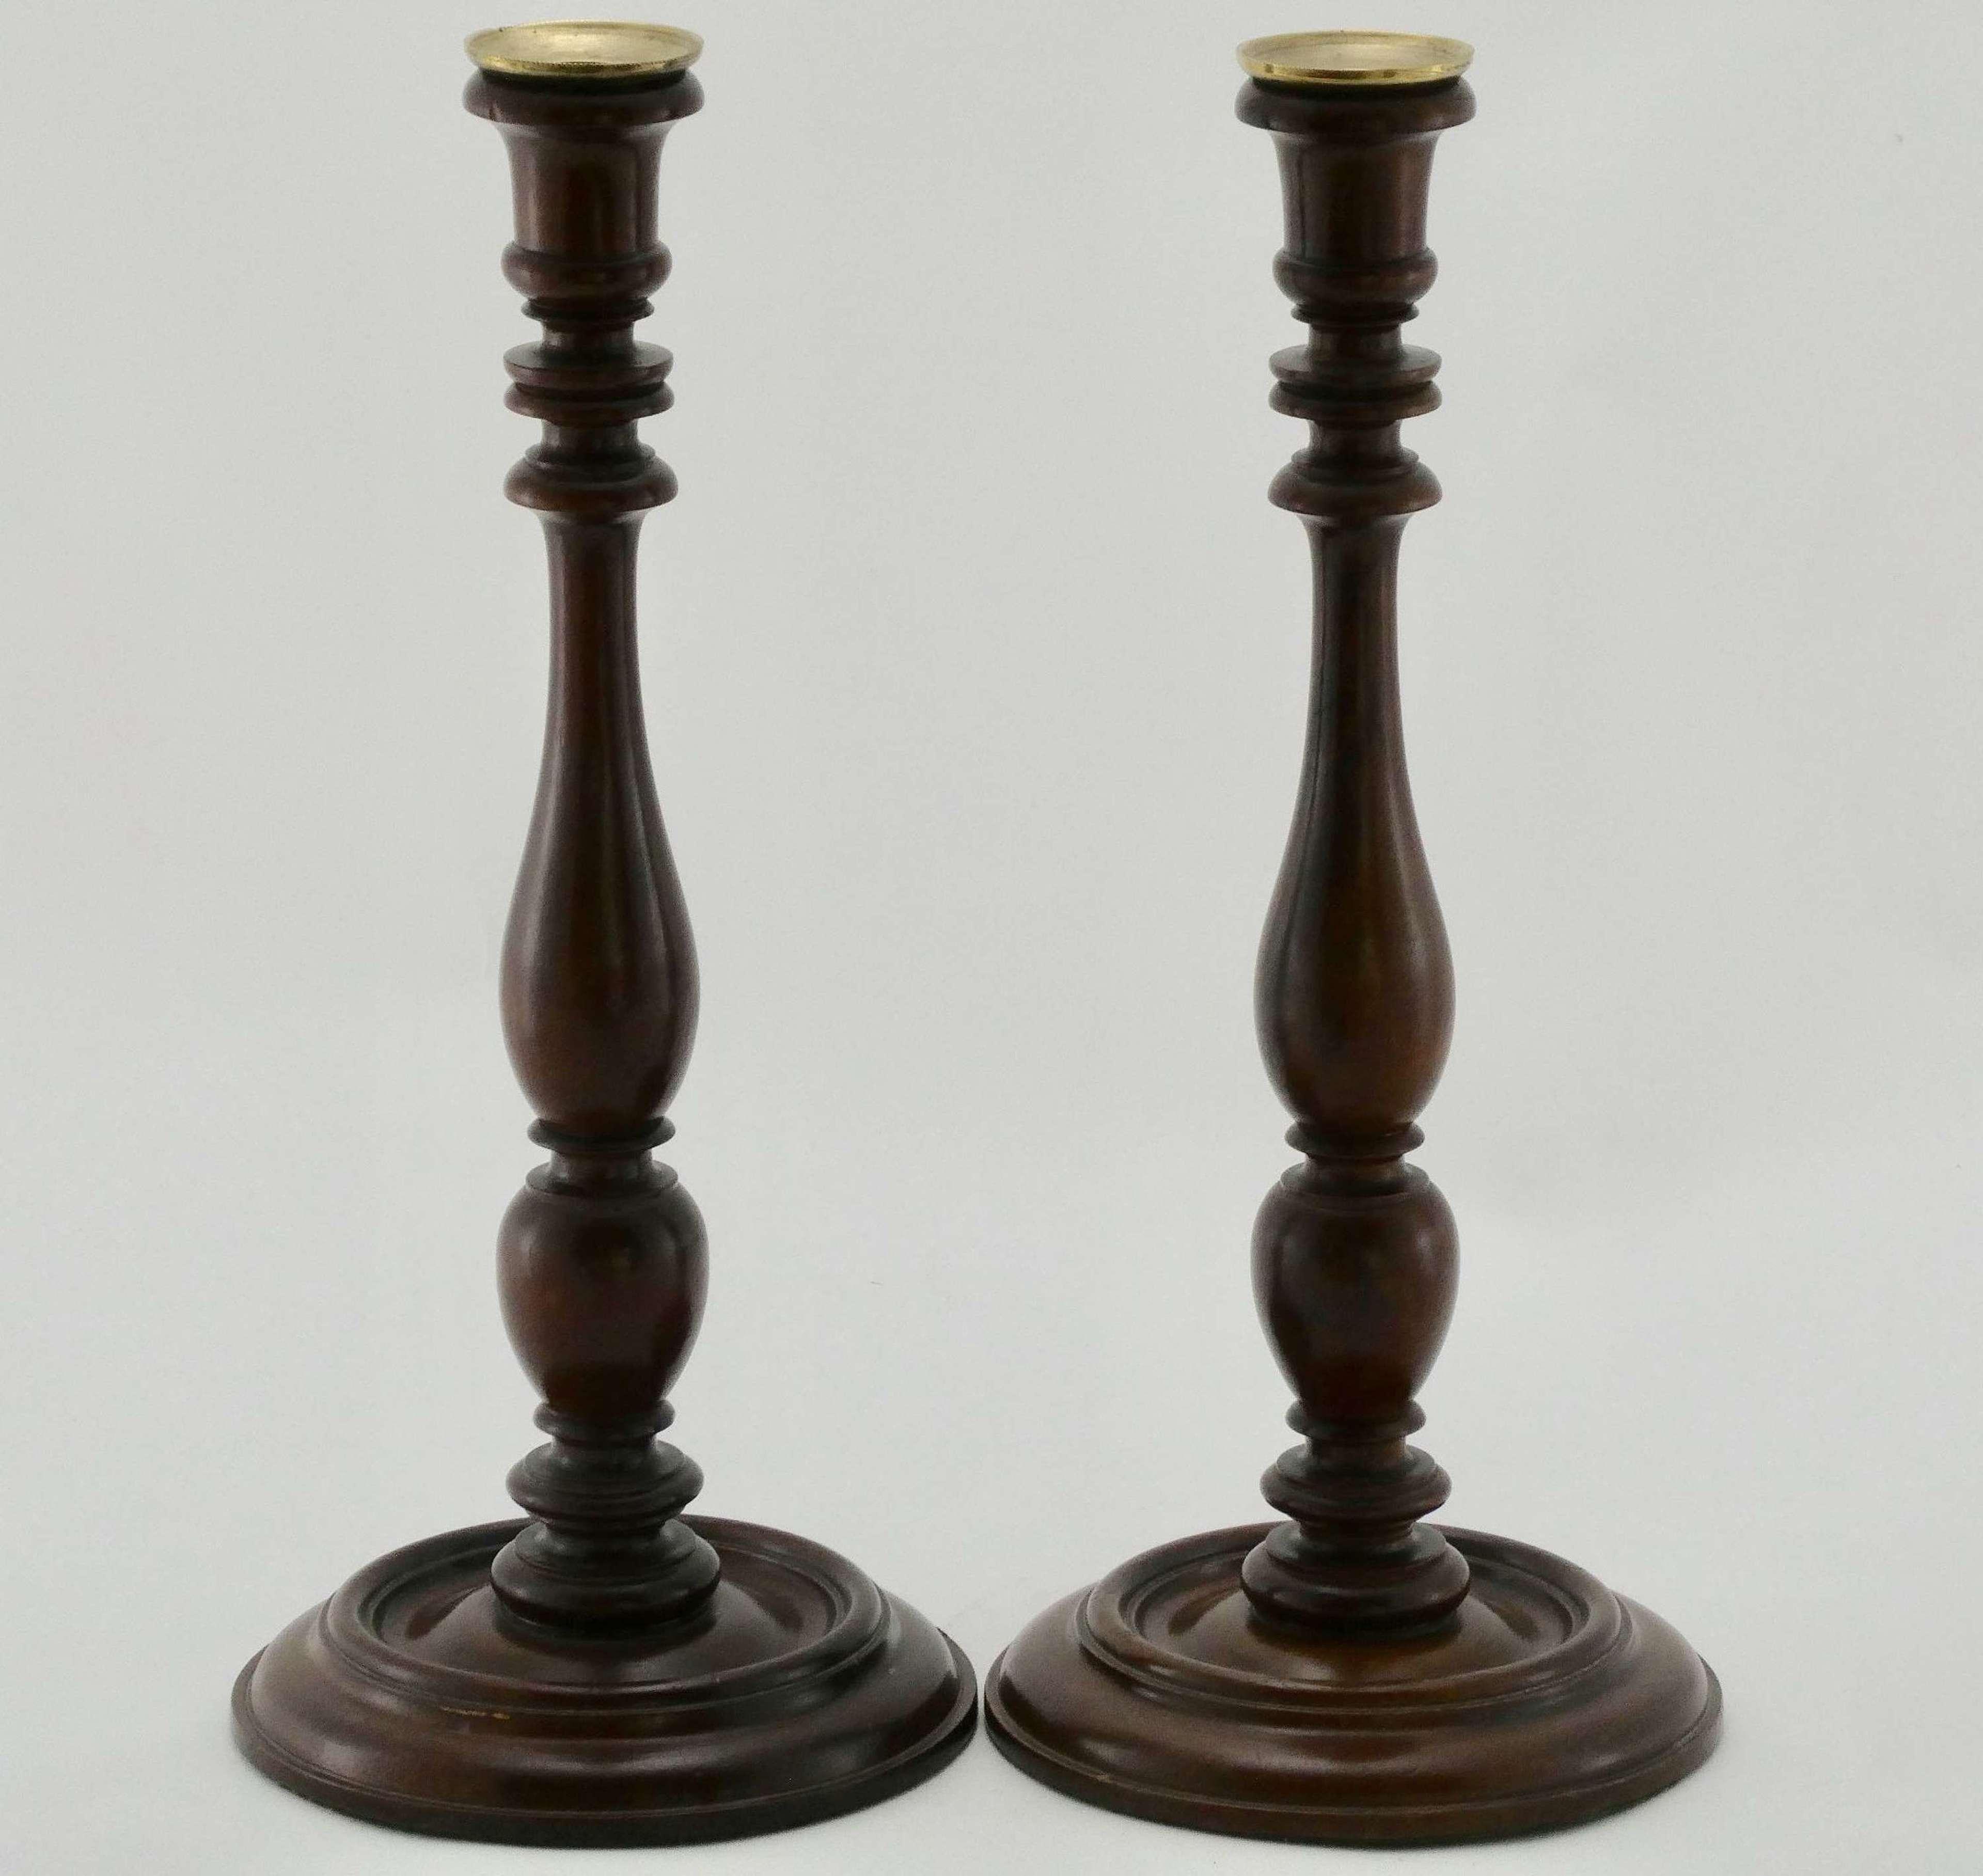 Pair of 19th Century Treen Candlesticks